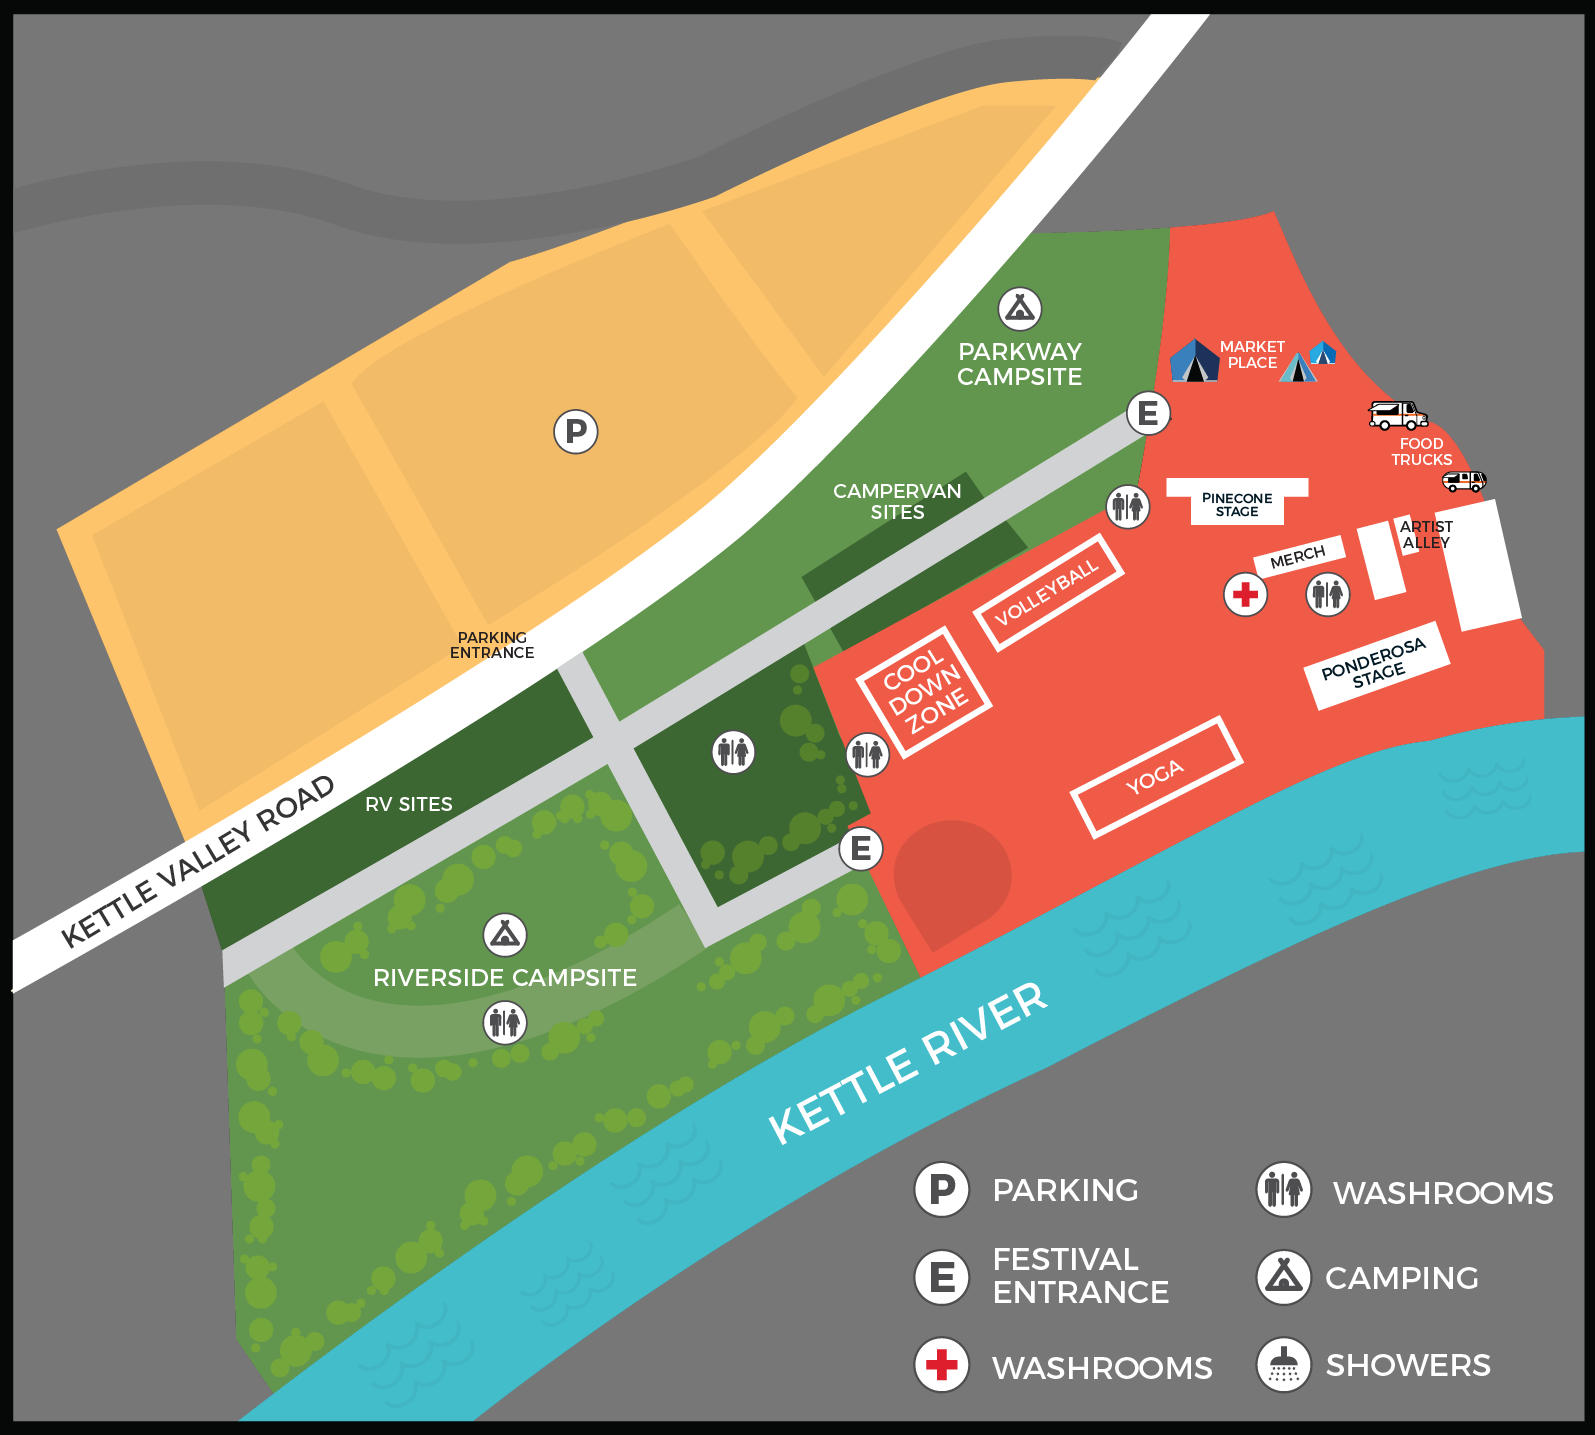 Ponderosa 2018 Map